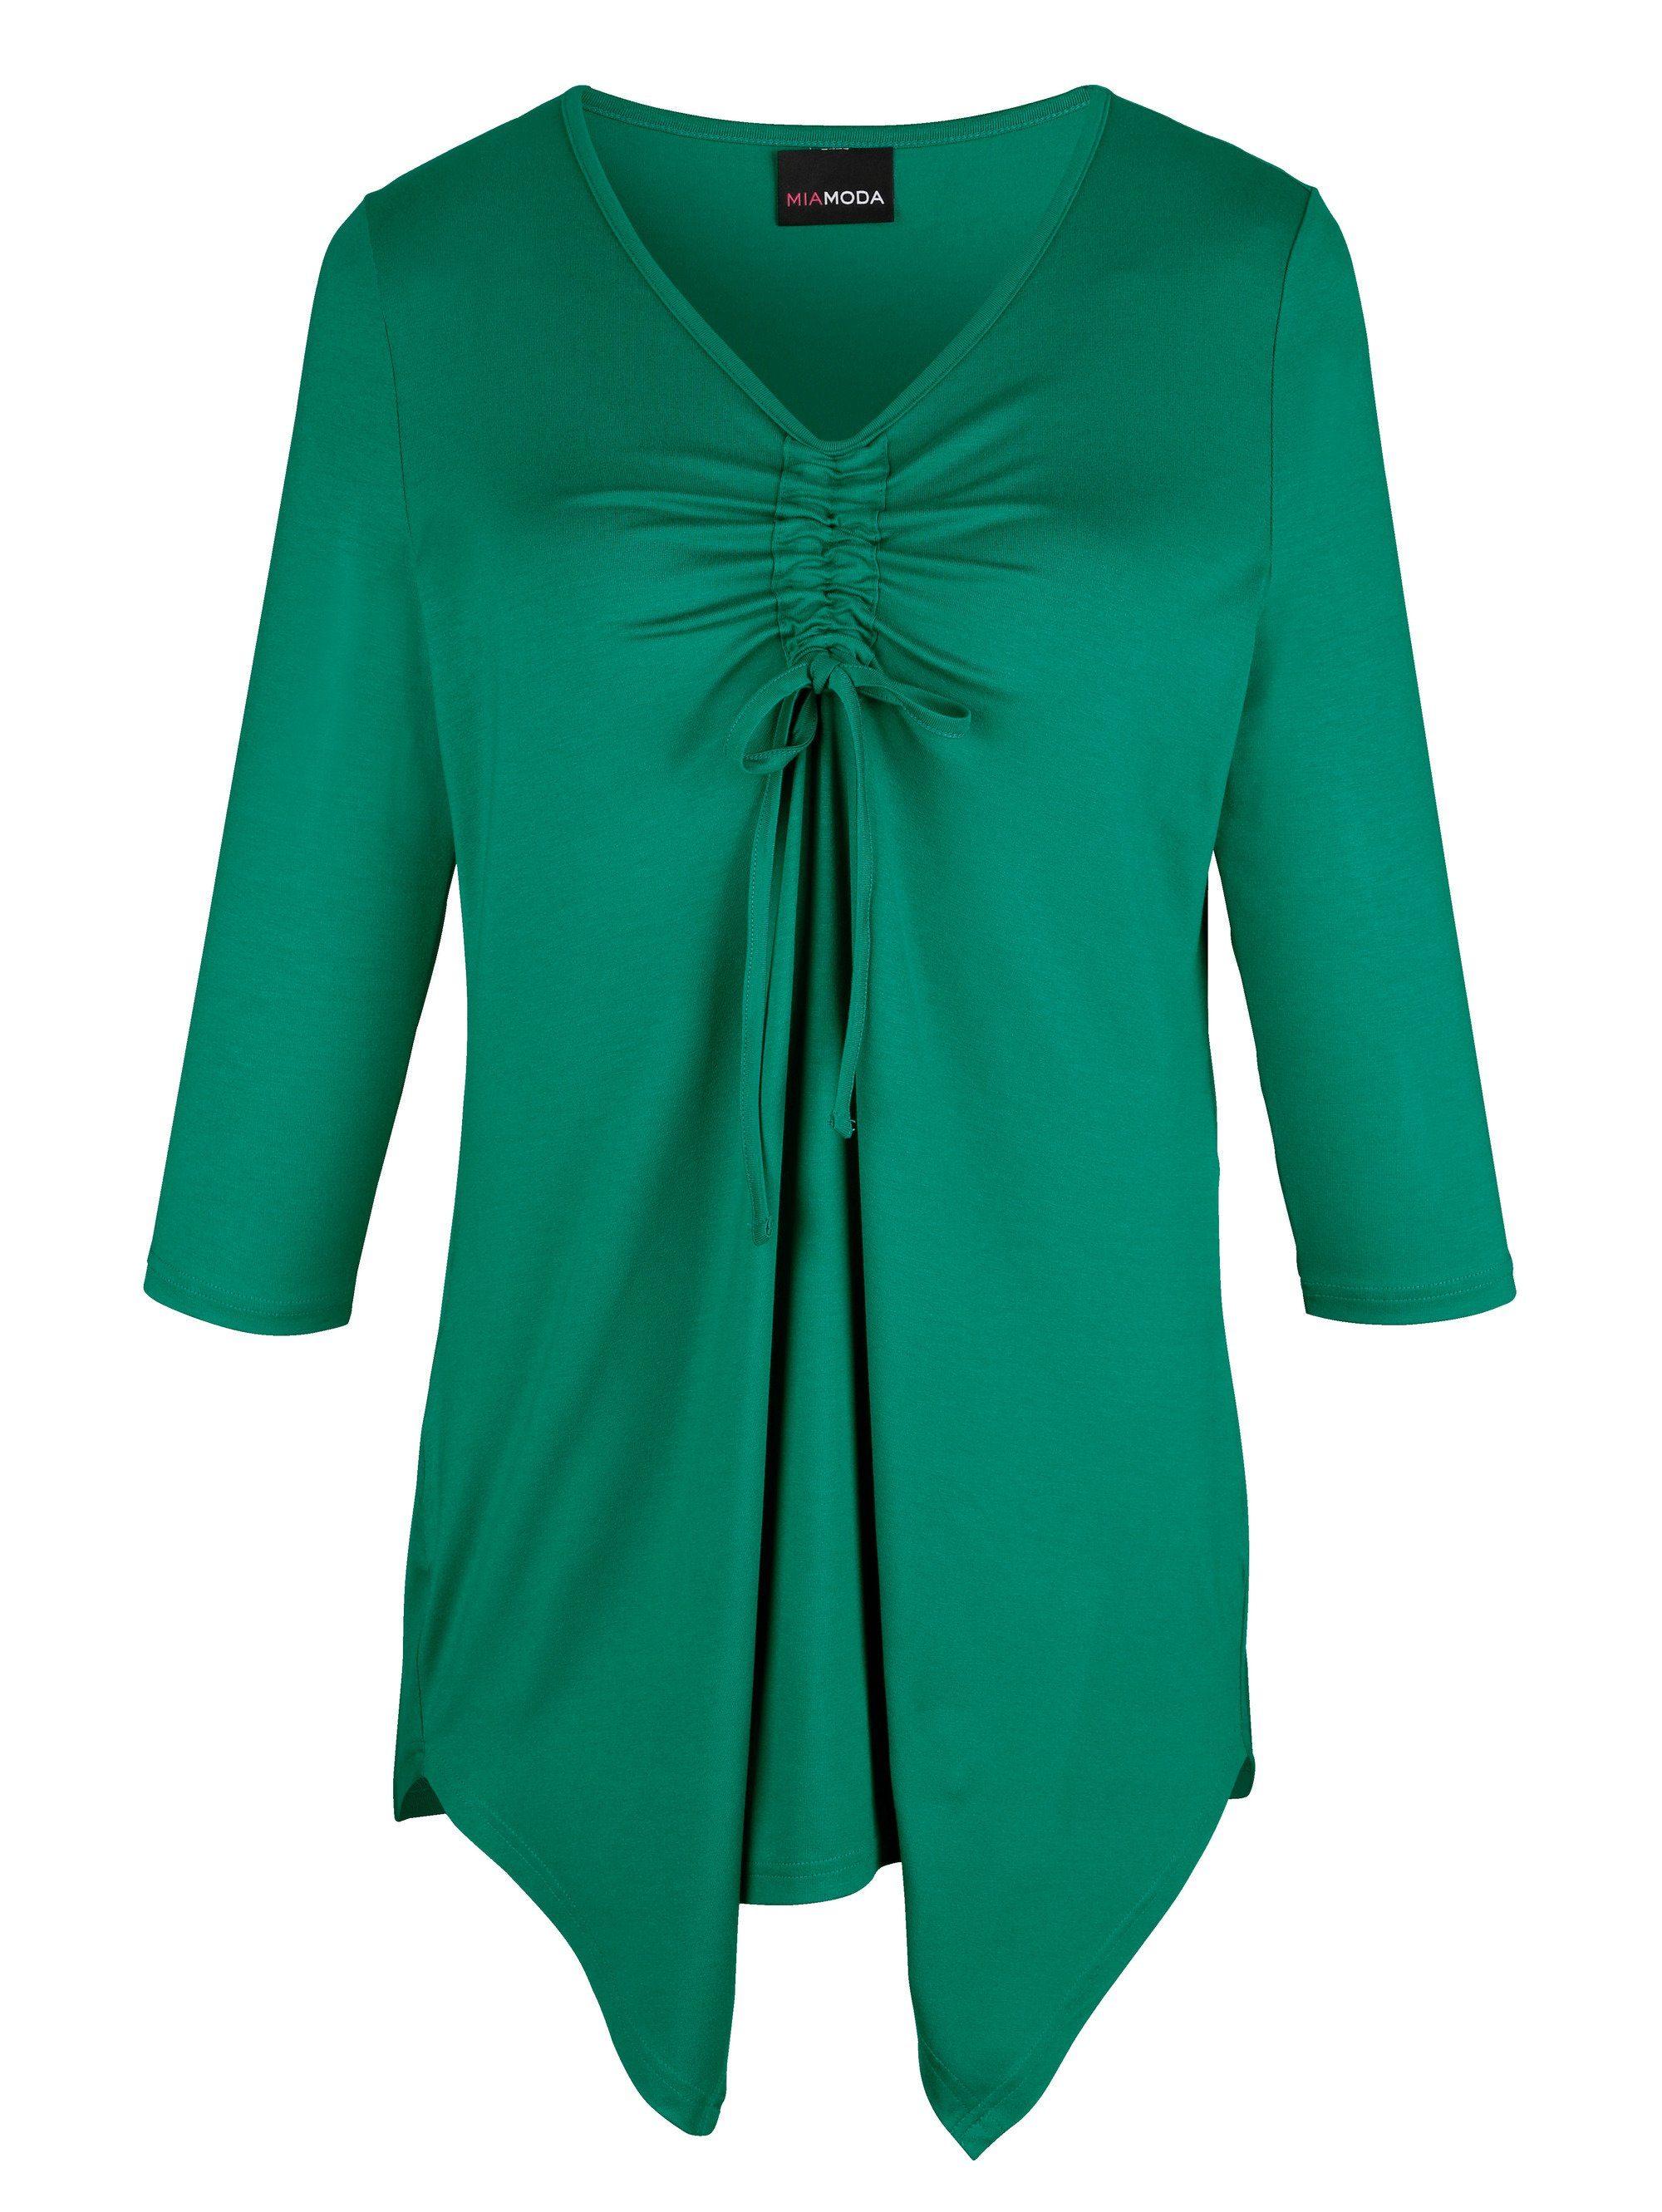 MIAMODA Zipfelshirt mit Raffung und Bindeband am Ausschnitt | Bekleidung > Shirts > Zipfelshirts | Grün | Viskose | MIAMODA